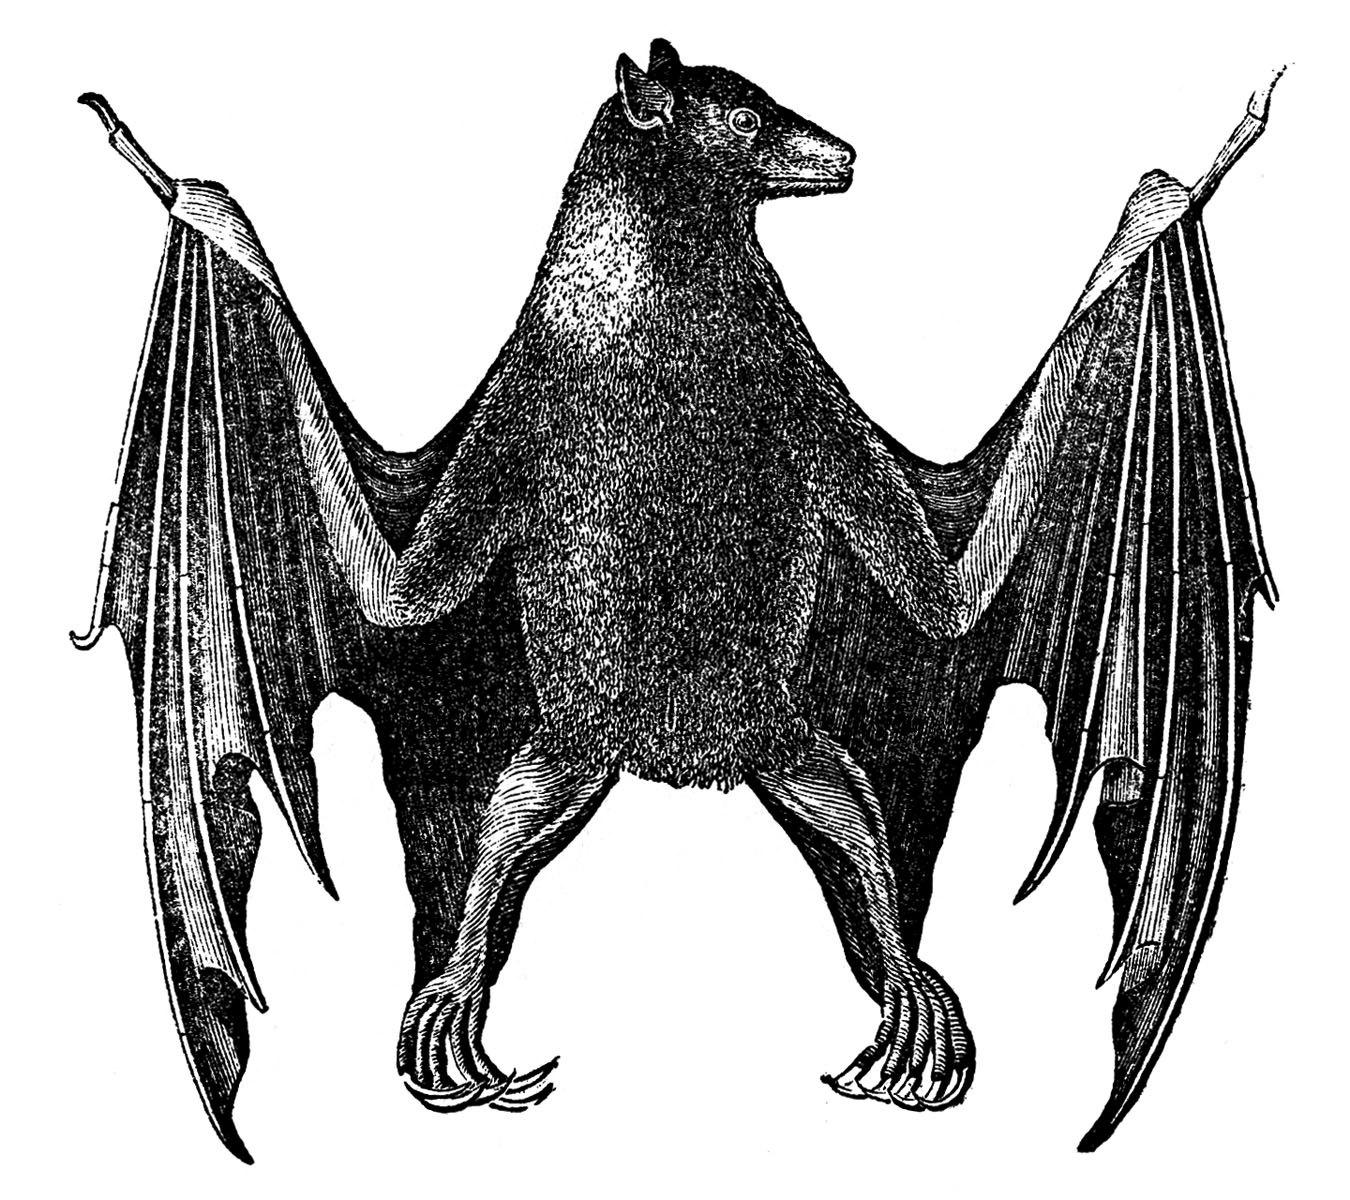 Antique Natural History Image - Bat - Halloween - The ...